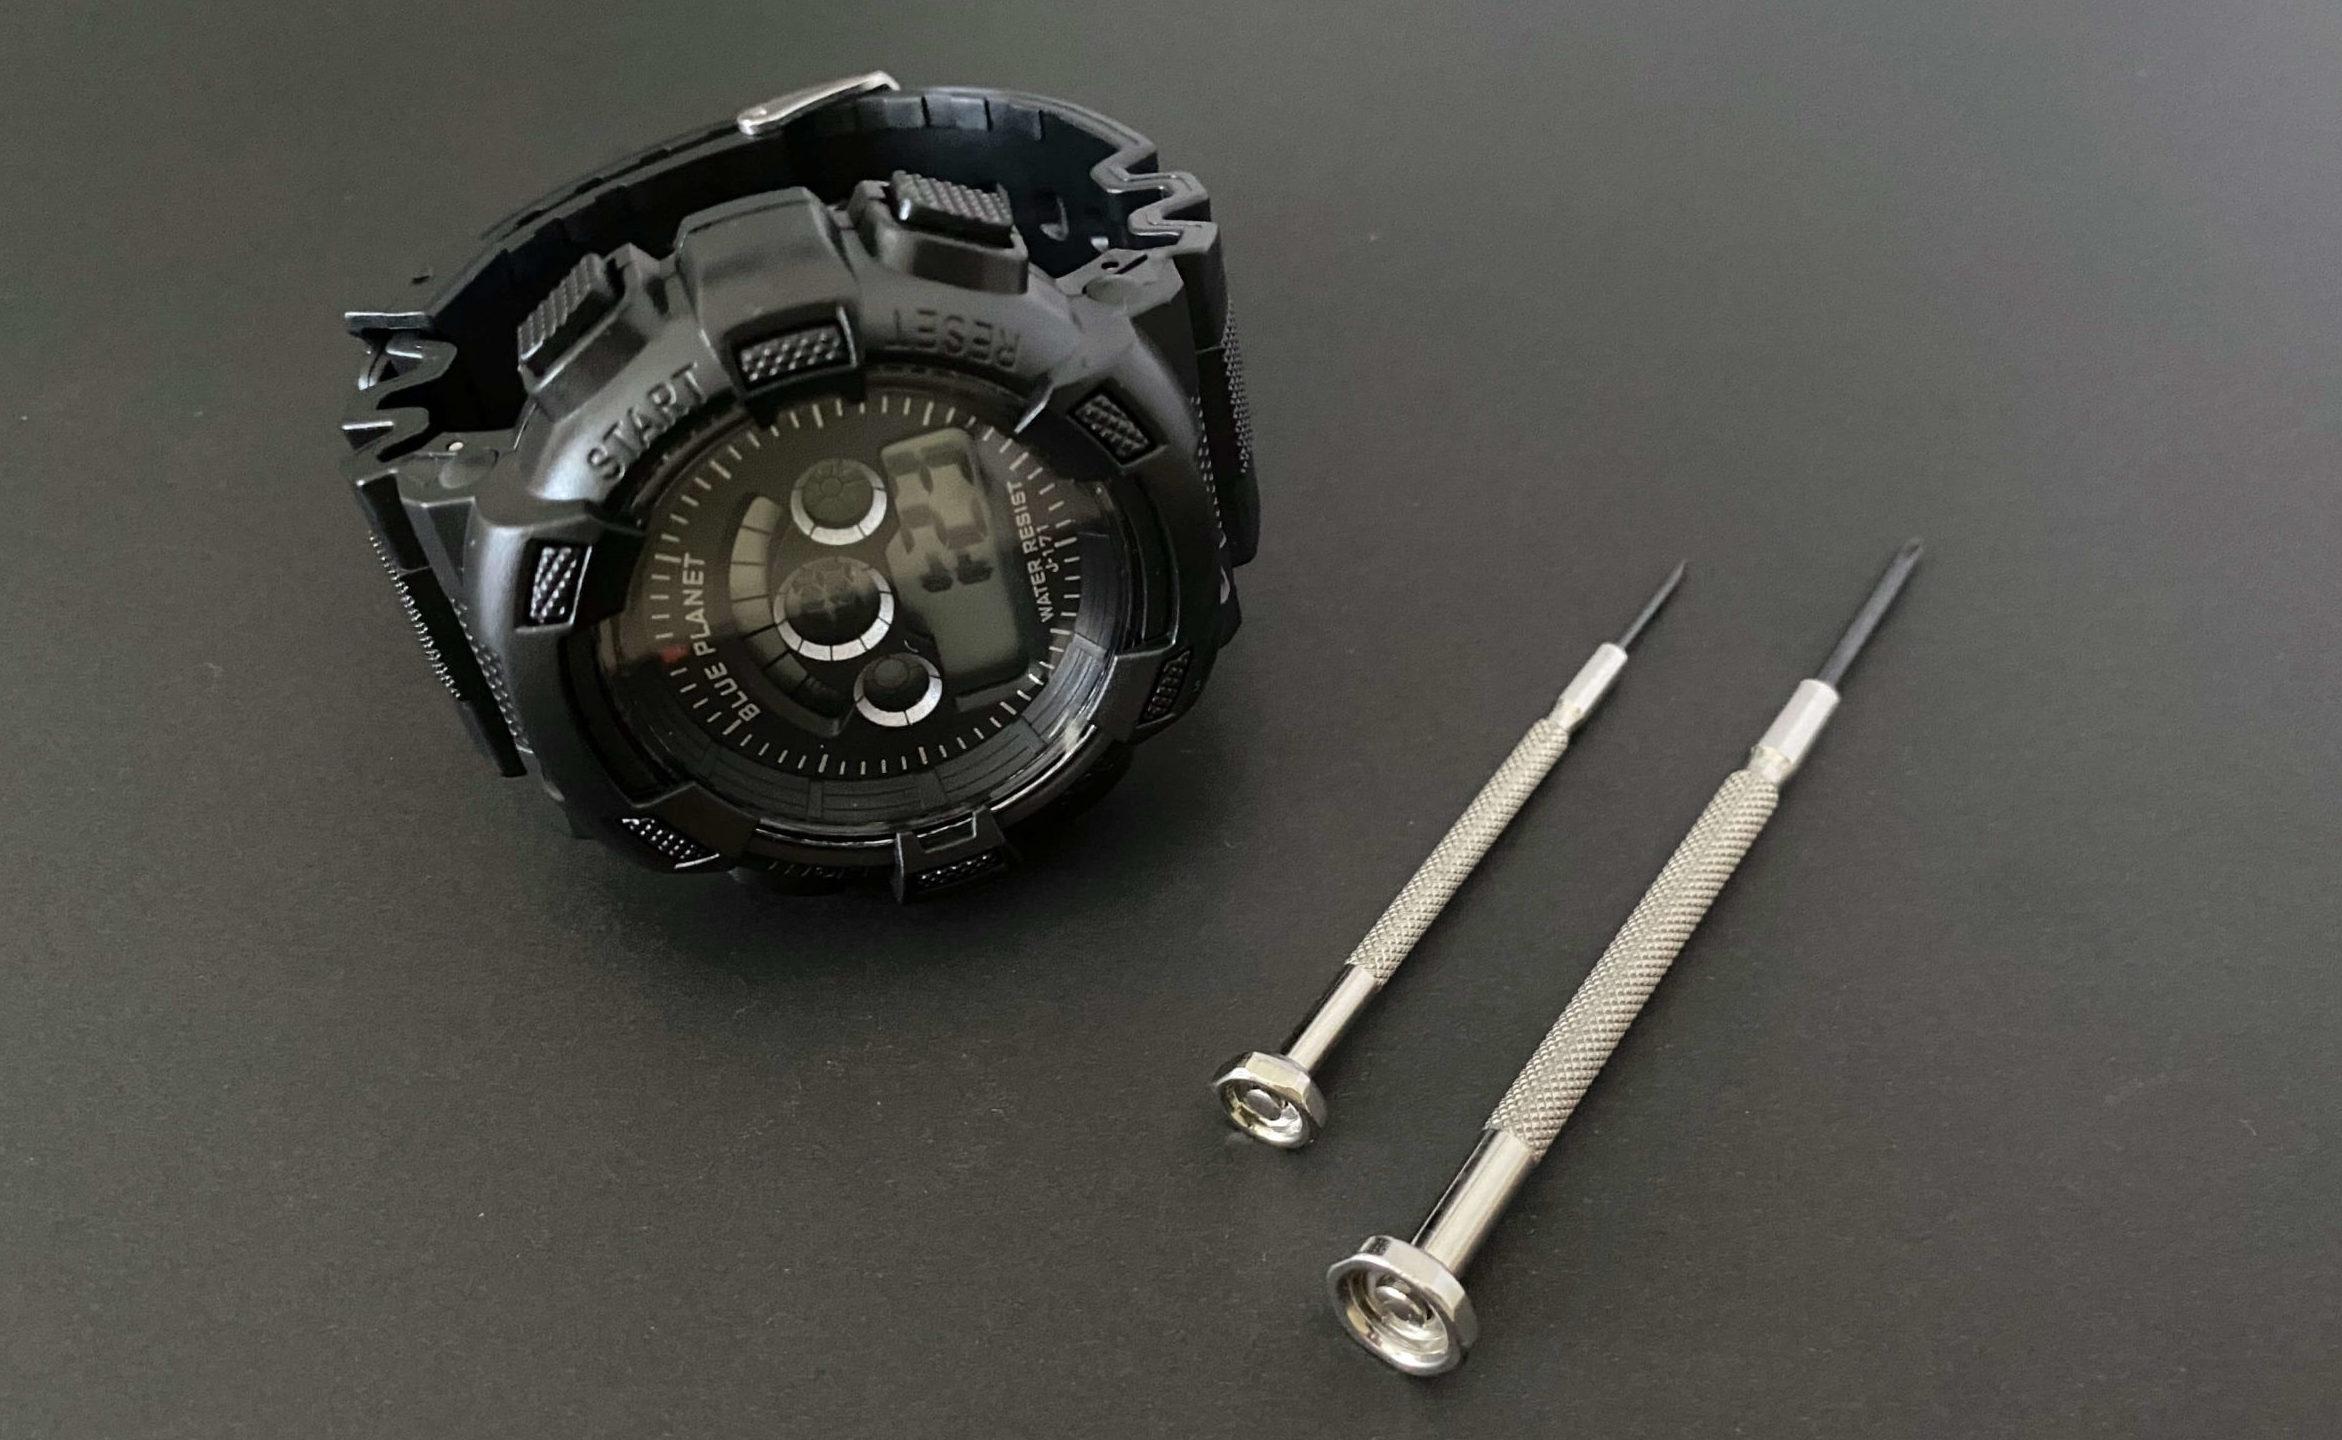 CR2032を電池交換したダイソー腕時計